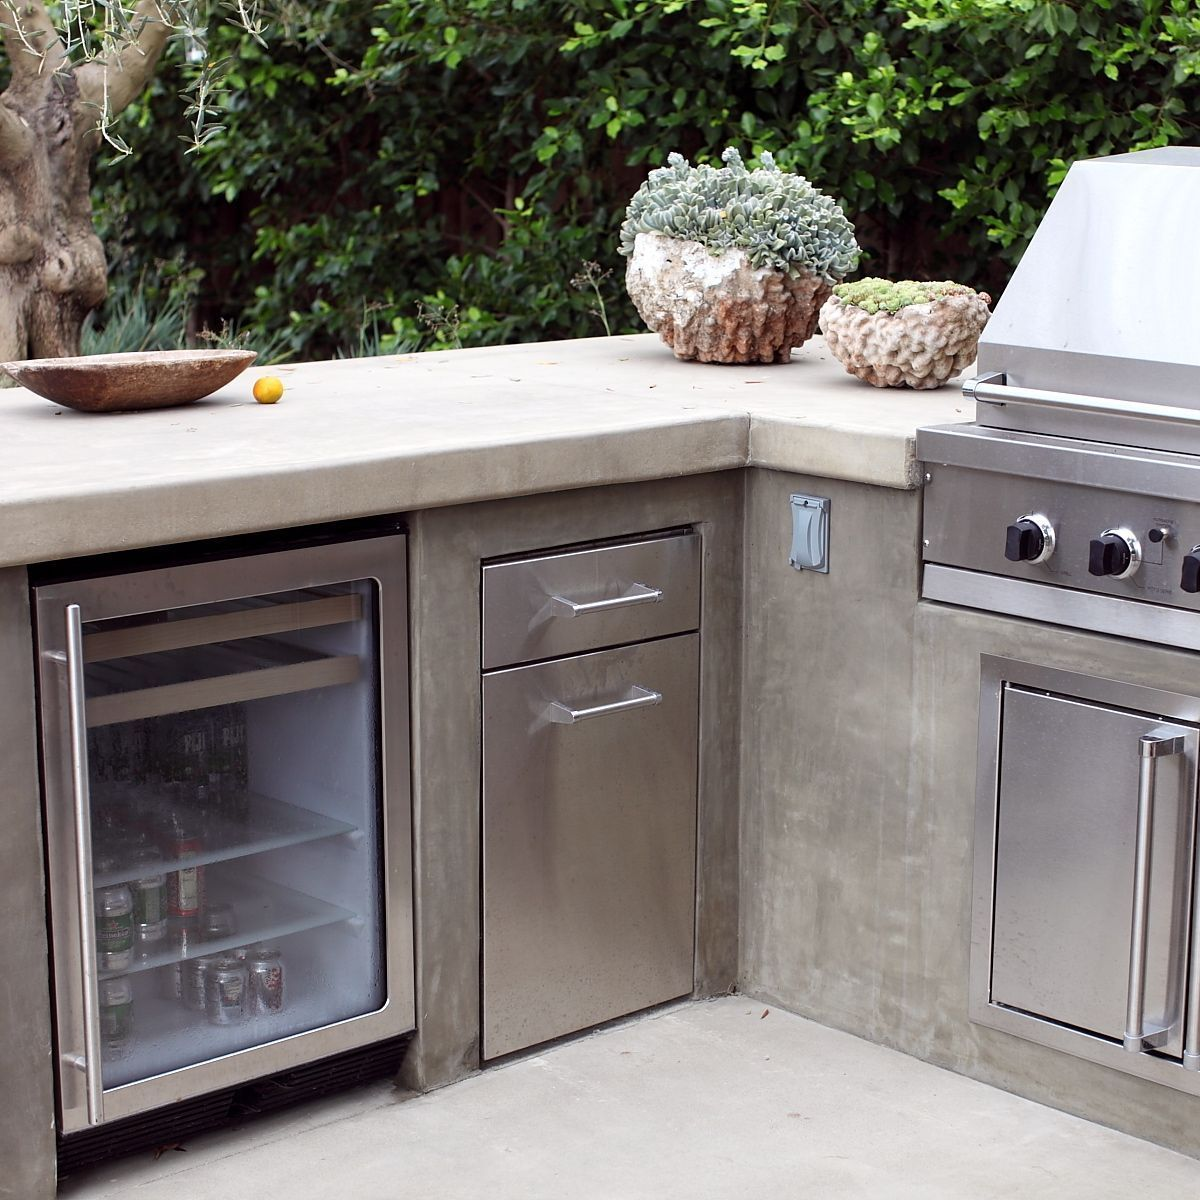 outdoor kitchen design ideas pictures tips expert advice homeapplianceskitchen appliances on outdoor kitchen appliances id=51949